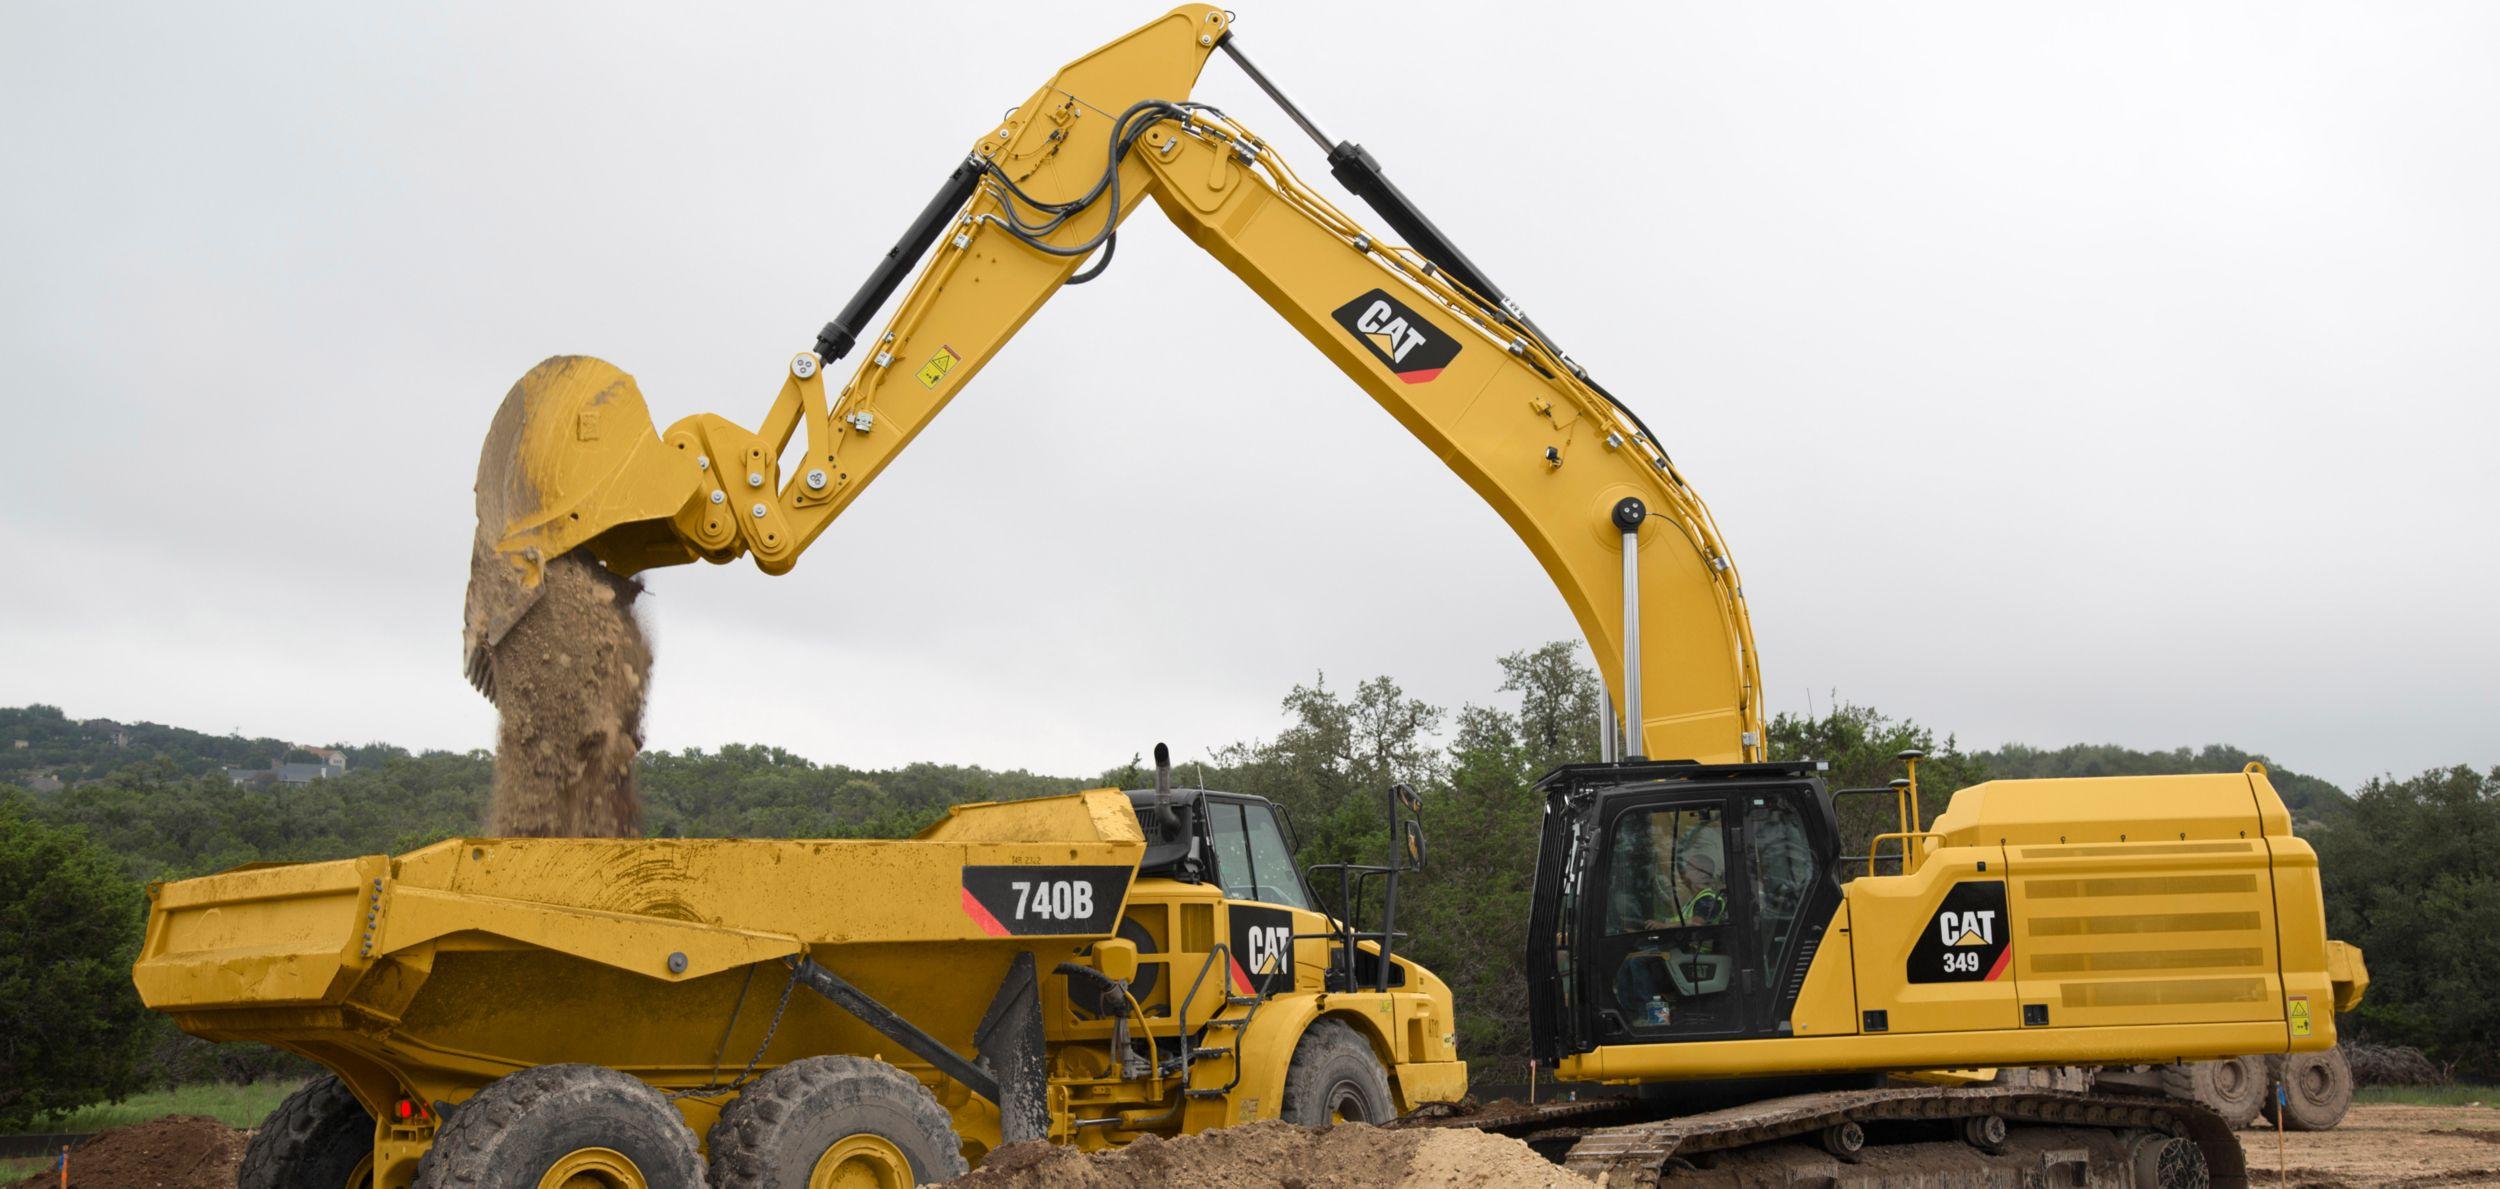 Cat® Excavators Deliver Increased Efficiency, Lower Operating Costs